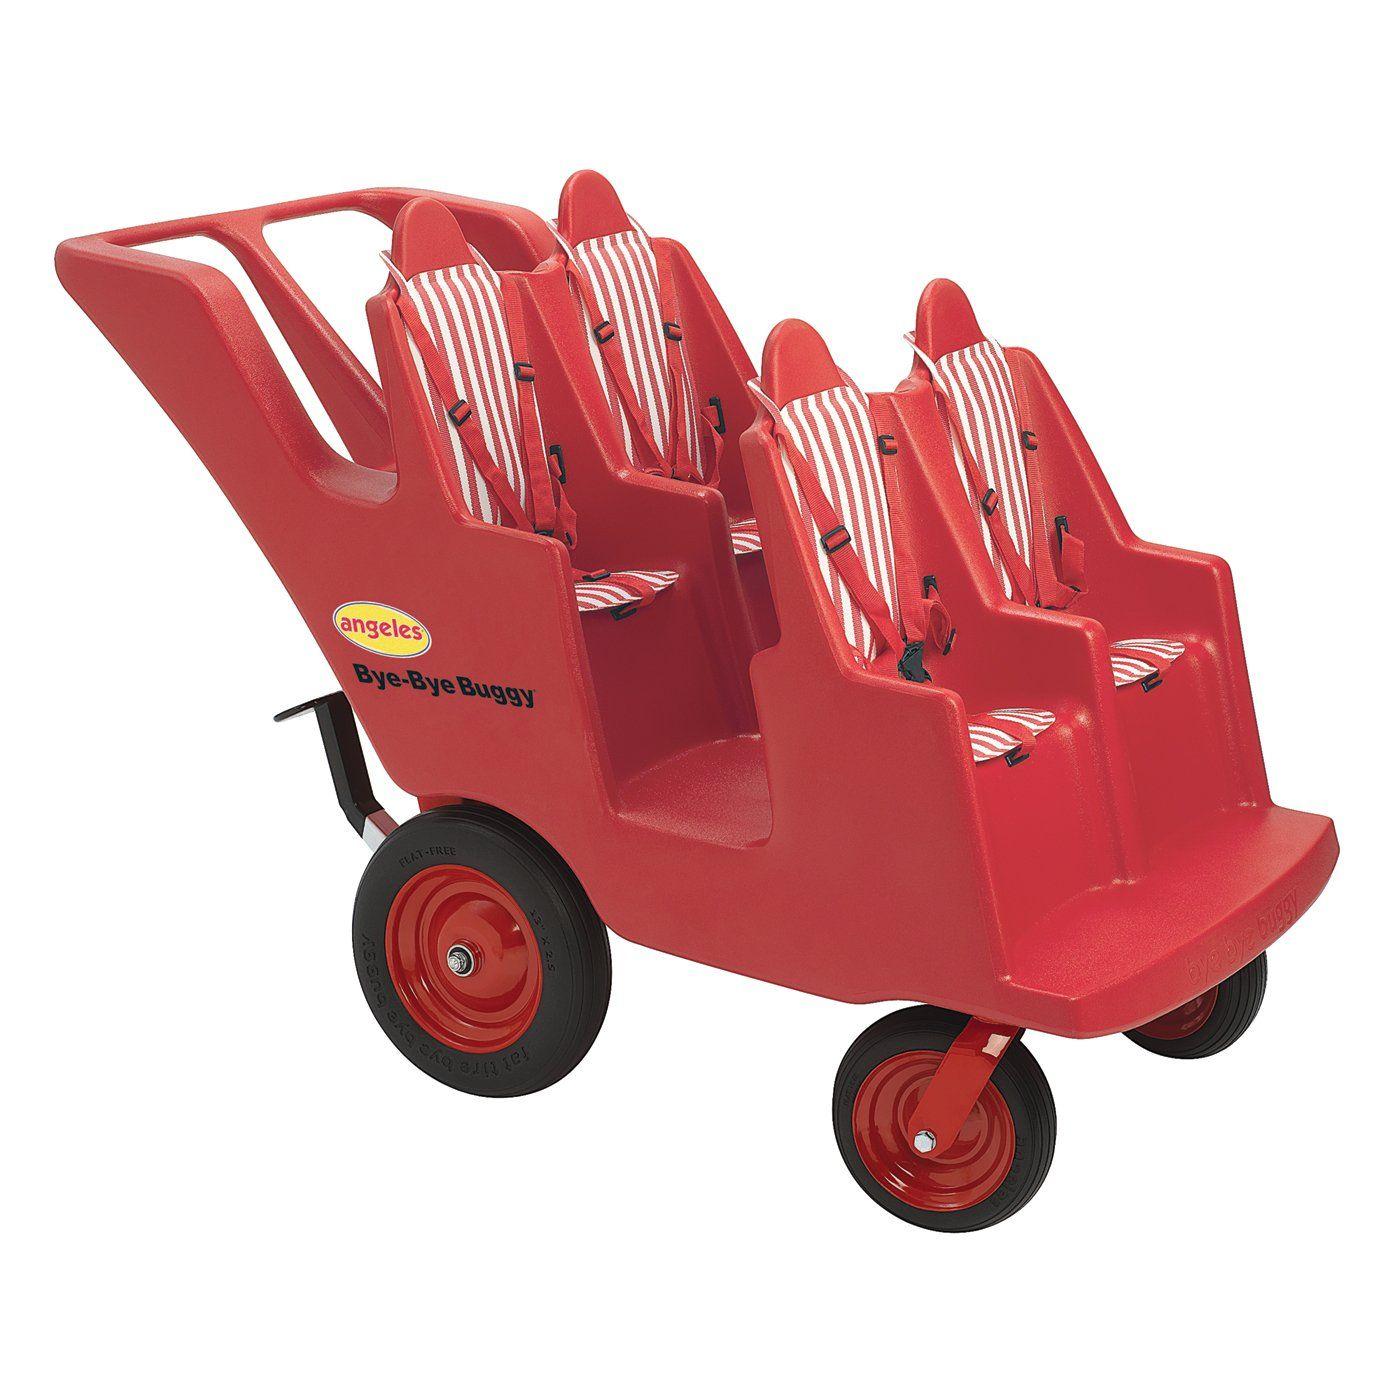 Quad Stroller 4 seat stroller Bye Bye stroller 6 seat stroller double